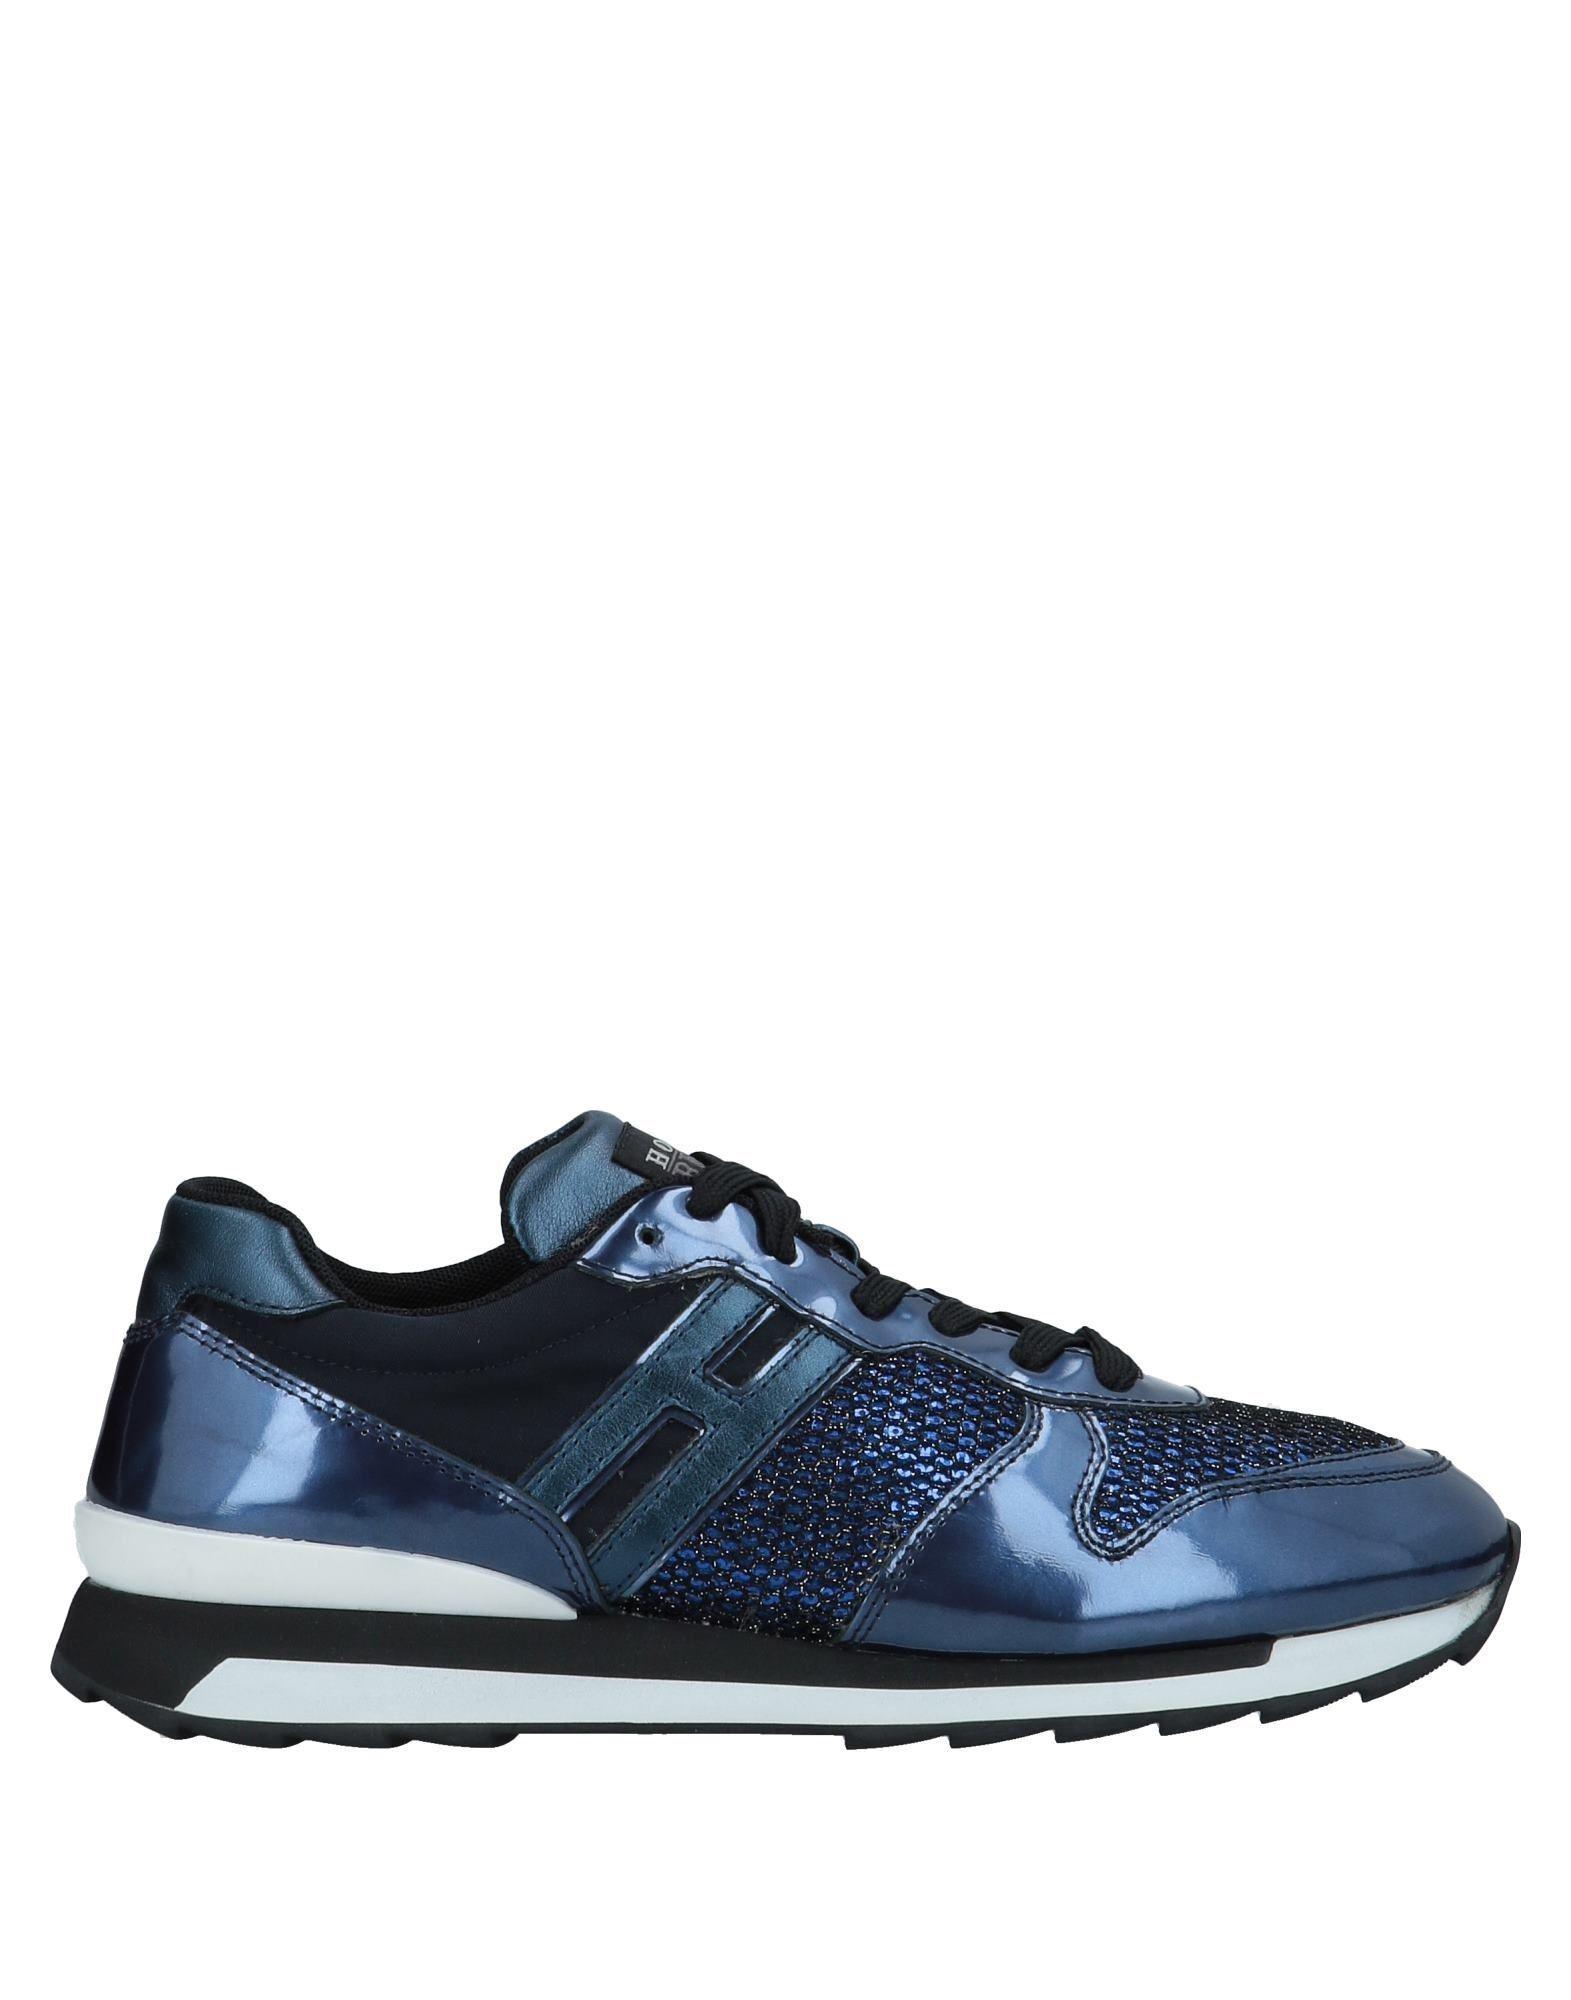 Lyst - Sneakers   Tennis basses Hogan Rebel en coloris Bleu 1295c594369